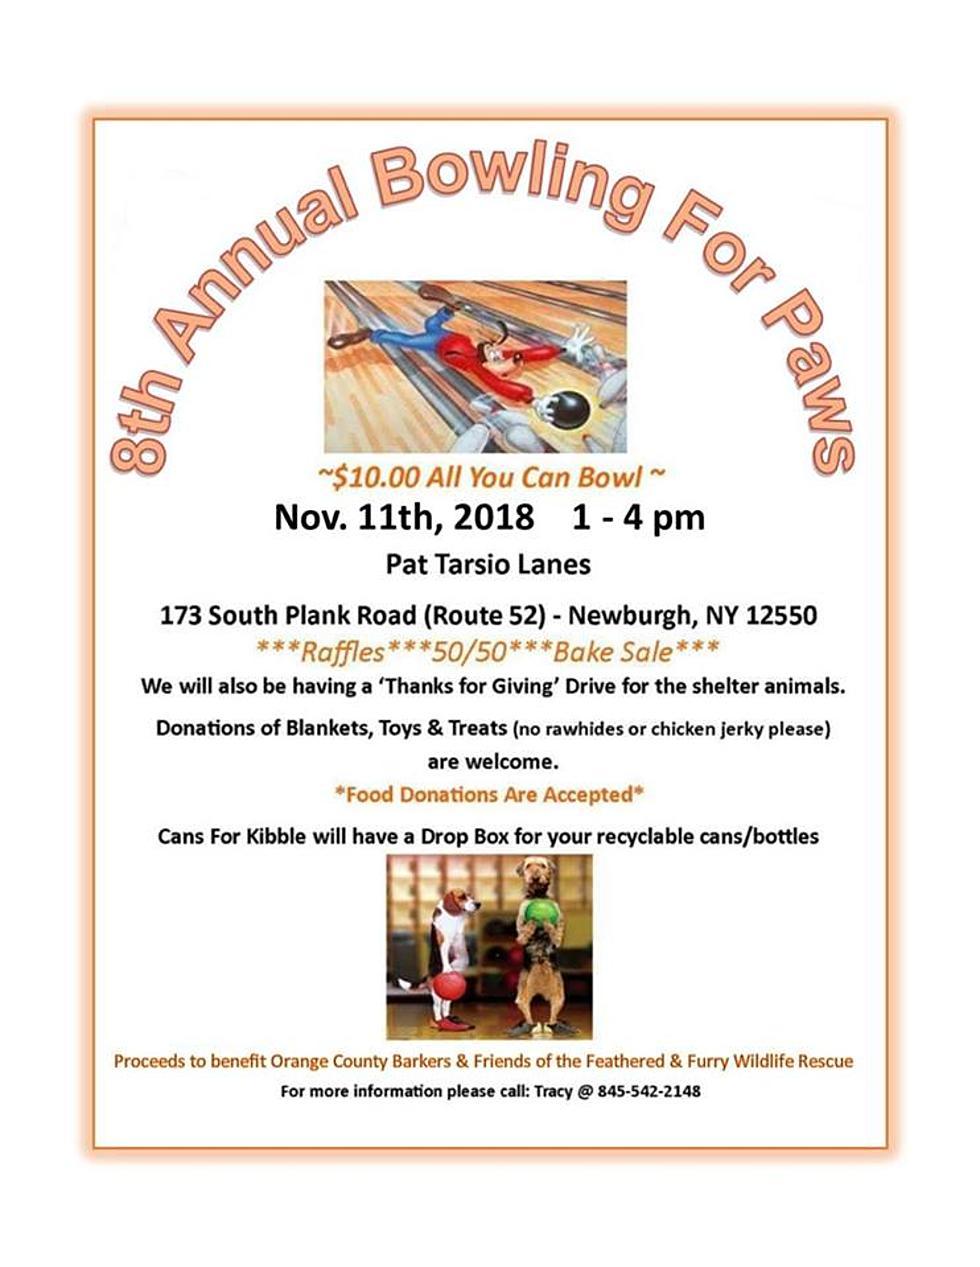 Newburgh Bowling 4 Paws